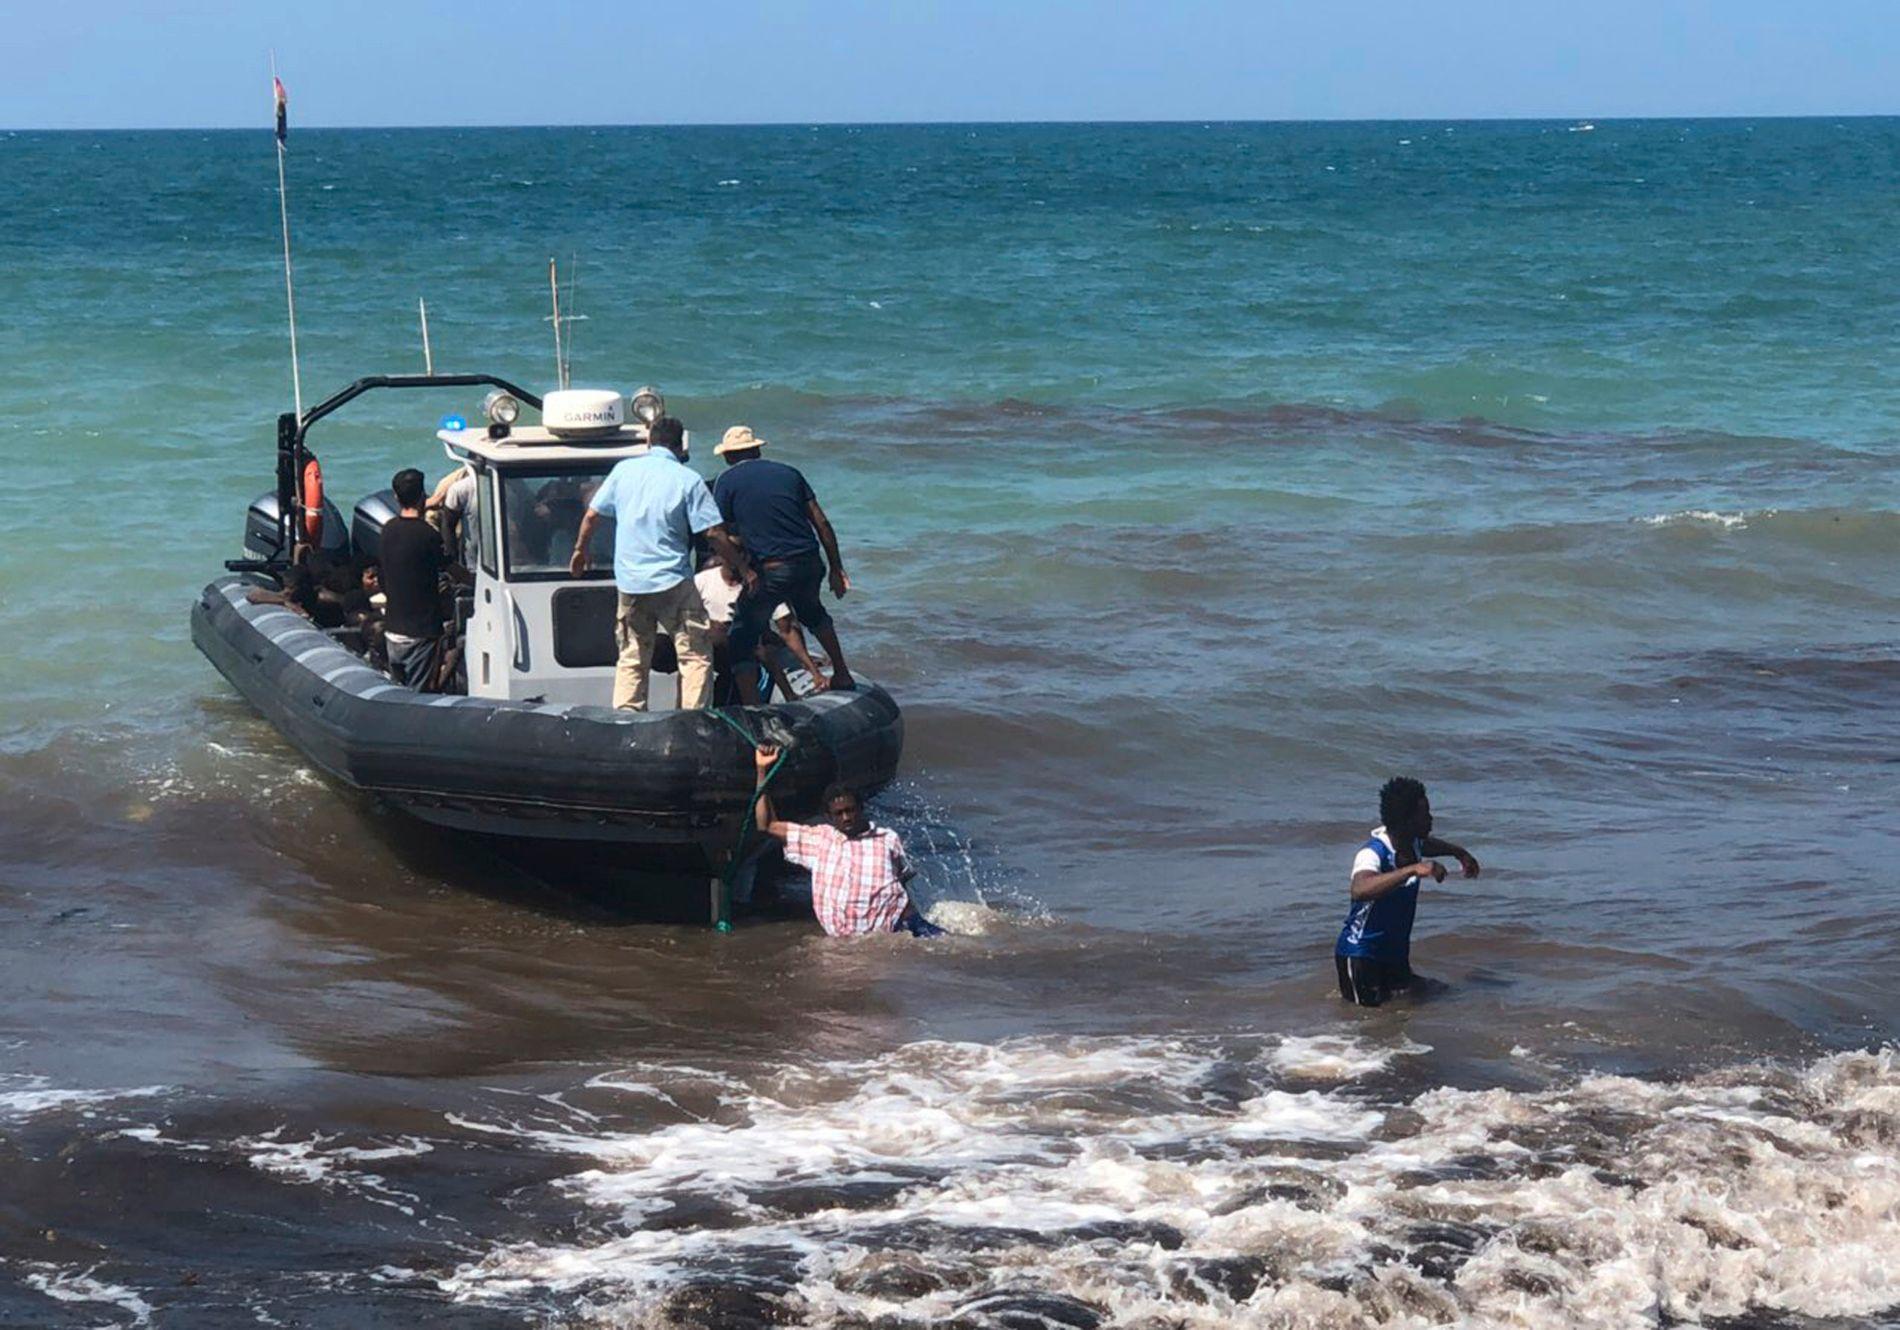 Libyas kystvakt sier de reddet rundt 80 afrikanske migranter etter at gummibåten de satt i forliste onsdag. 50 skal ha druknet. Foto: Libyan Coast Guard / AP / NTB scanpix